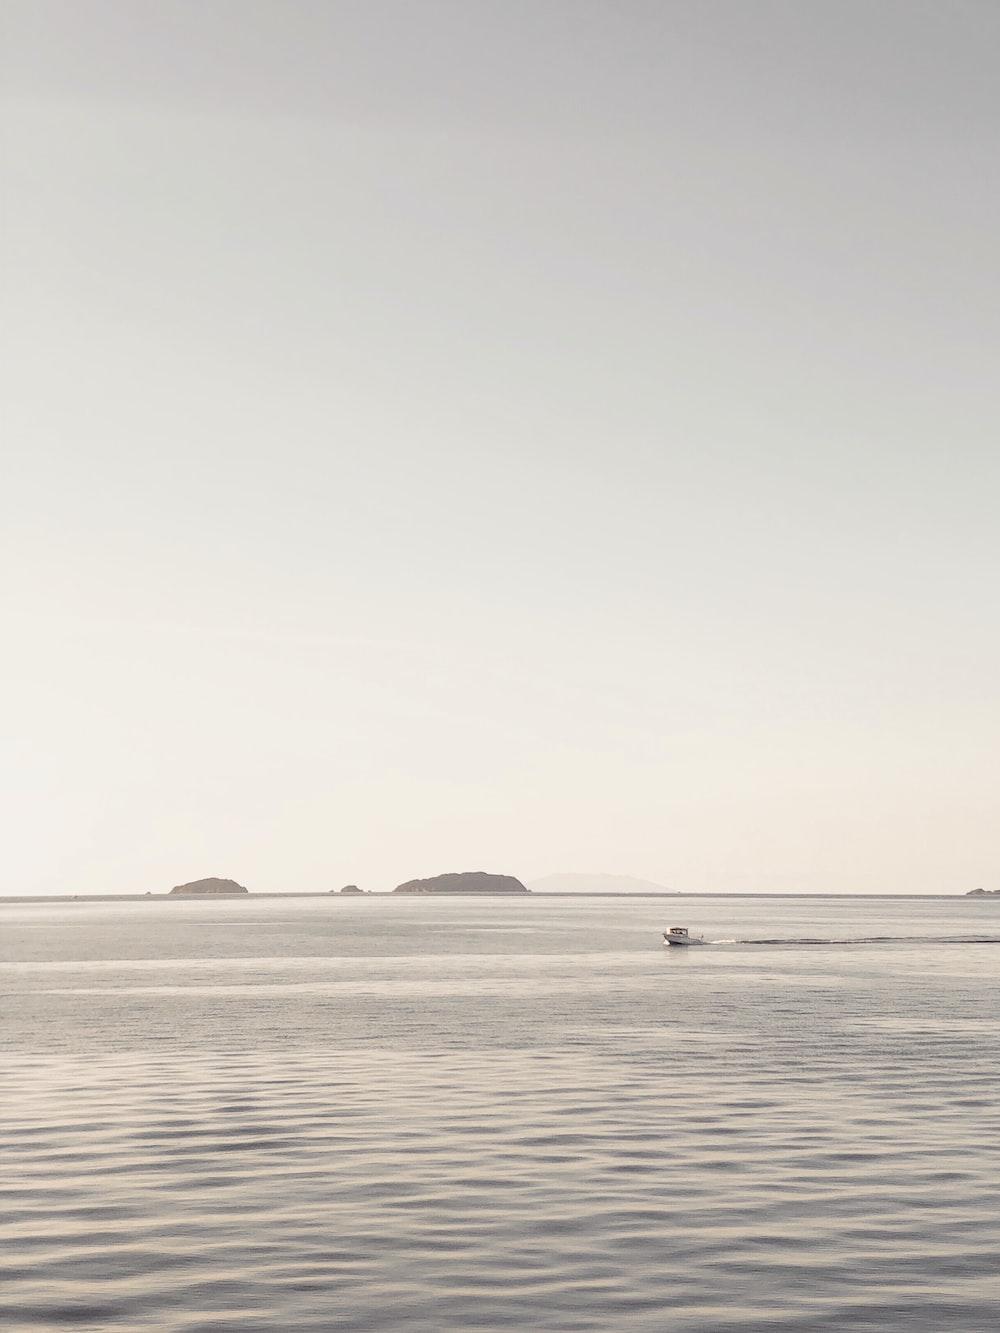 boat on sea under gray sky